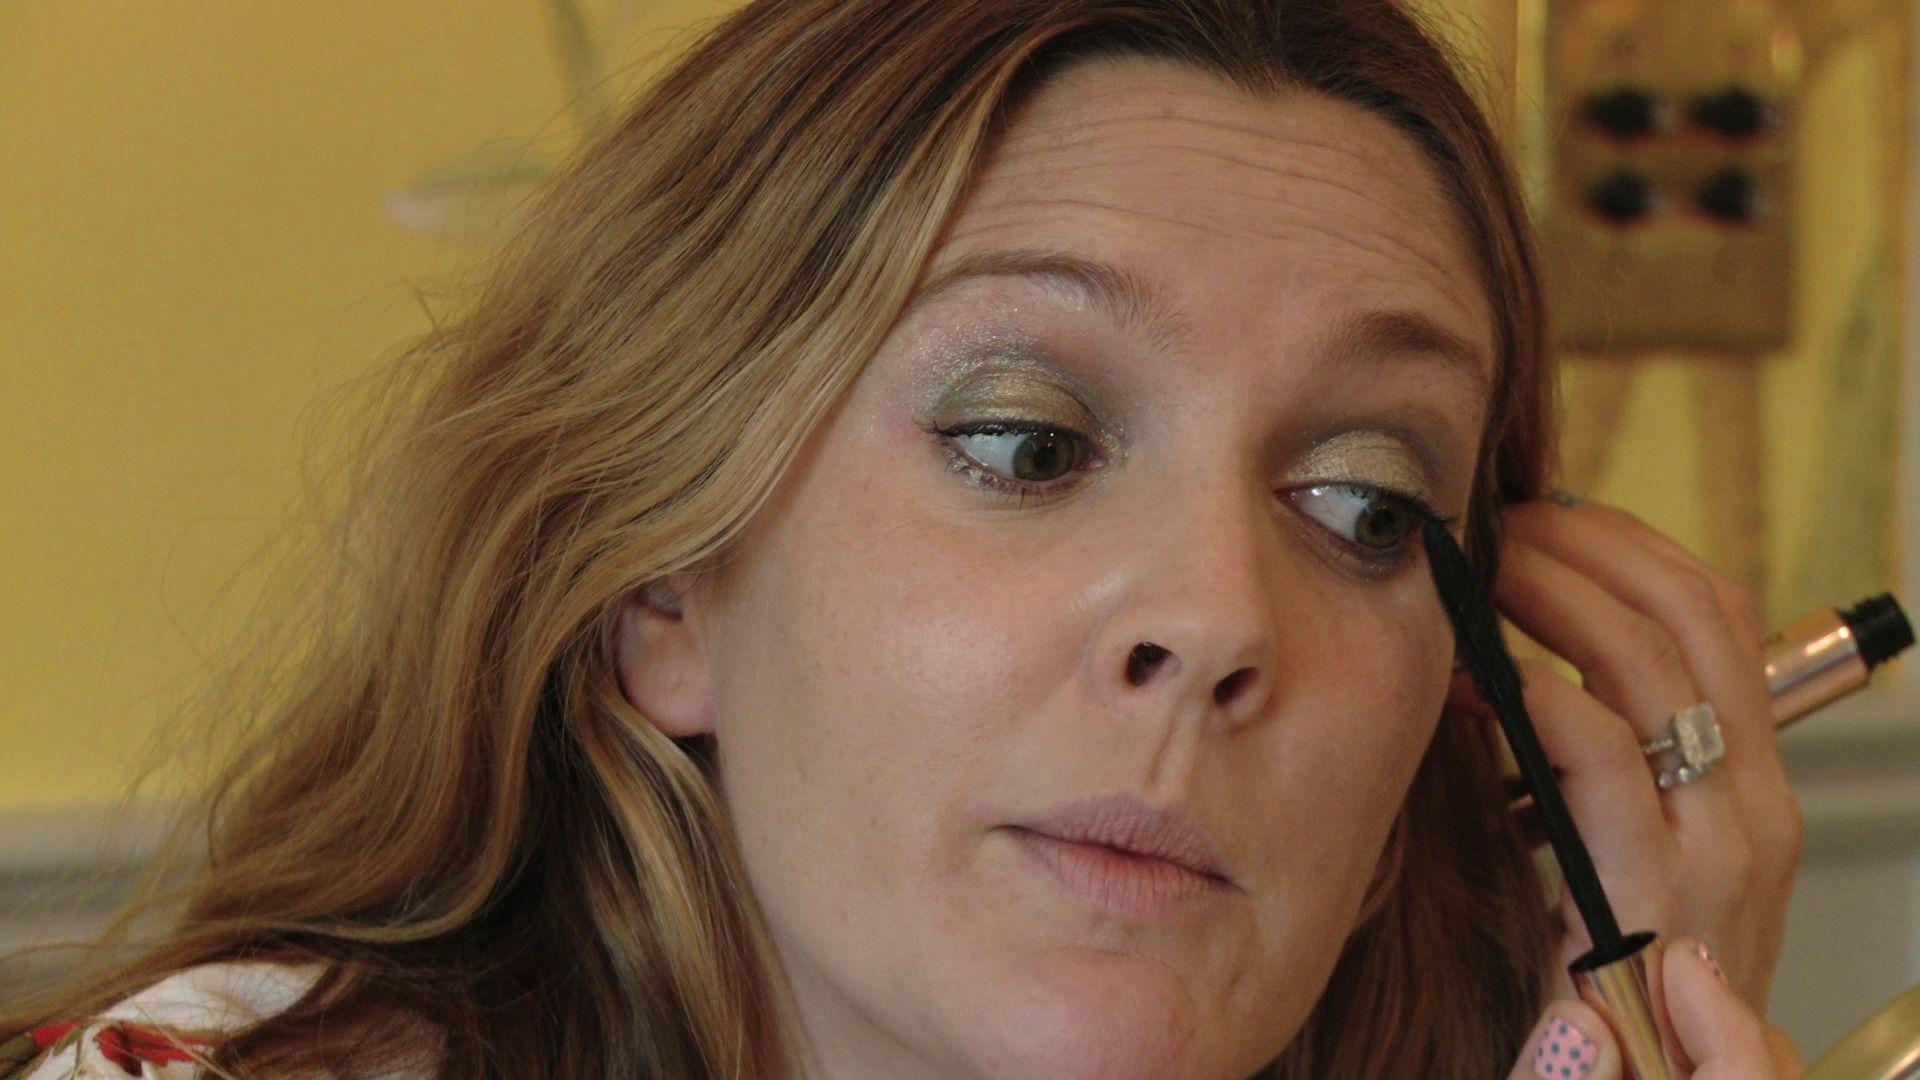 Flower beauty makeup cosmetics by drew barrymore eye makeup flower beauty makeup cosmetics by drew barrymore eye makeup behind glasses izmirmasajfo